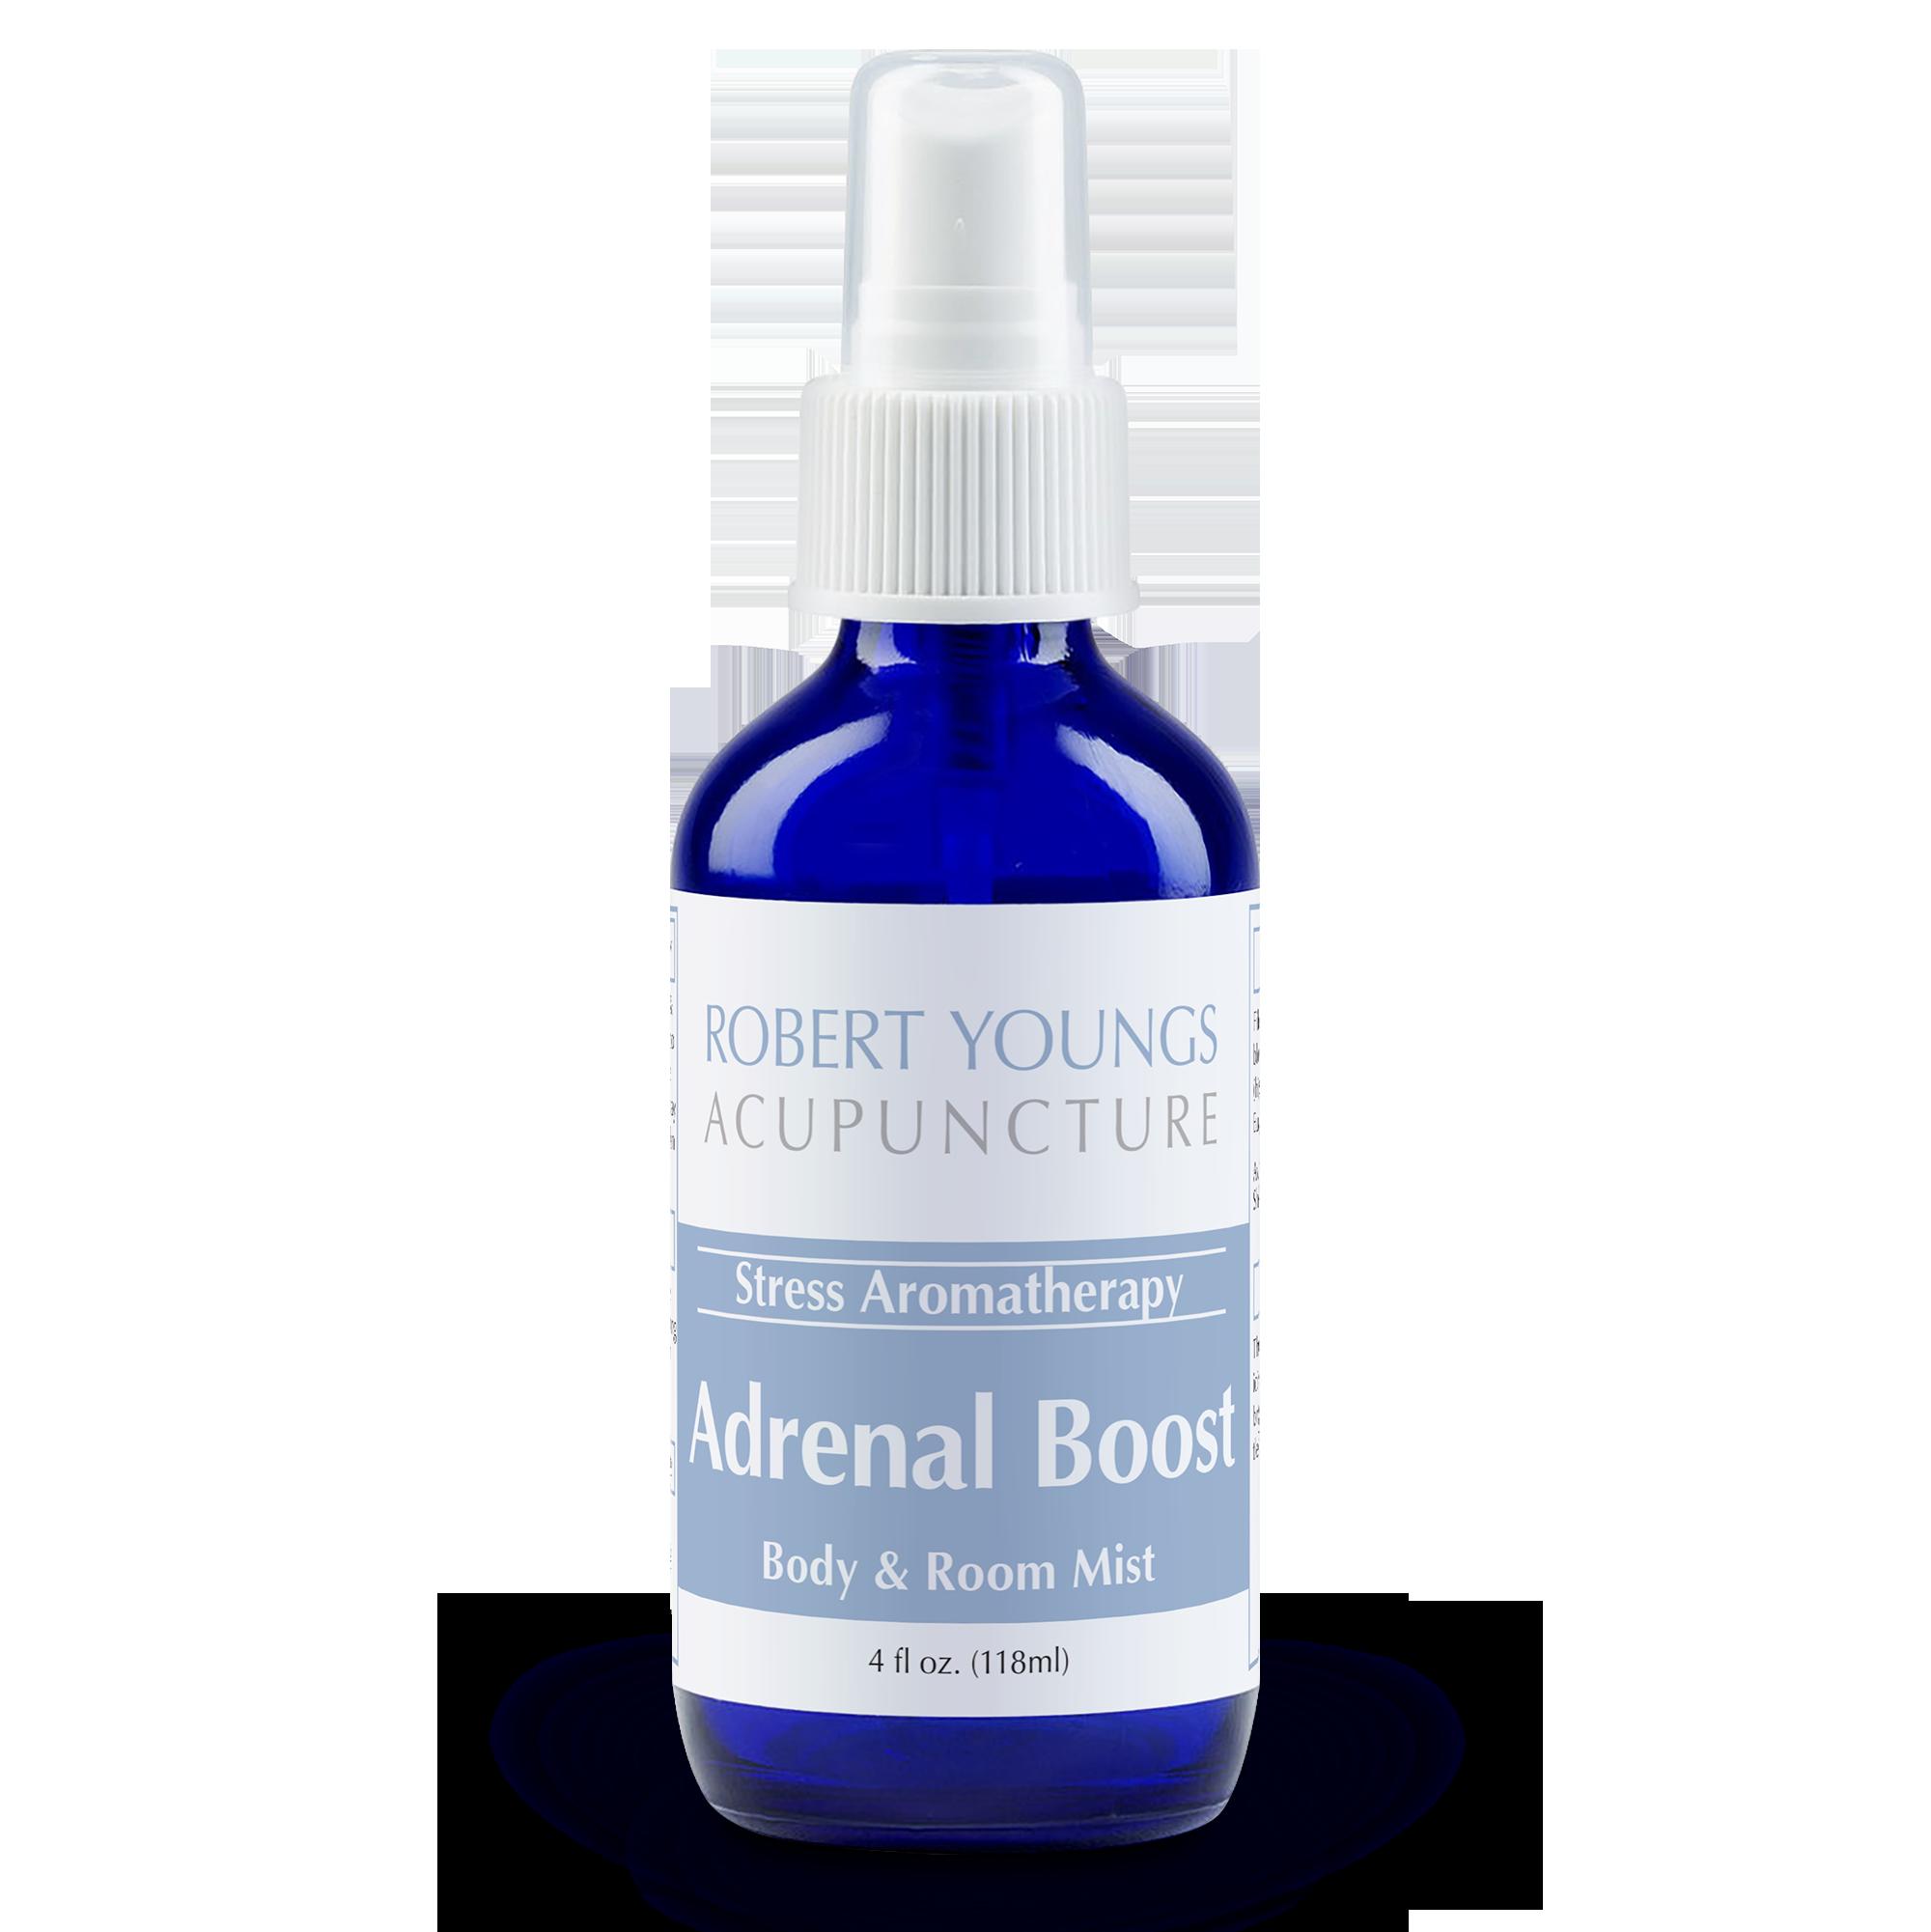 4oz 2x6 Adrenal Boost spray.png